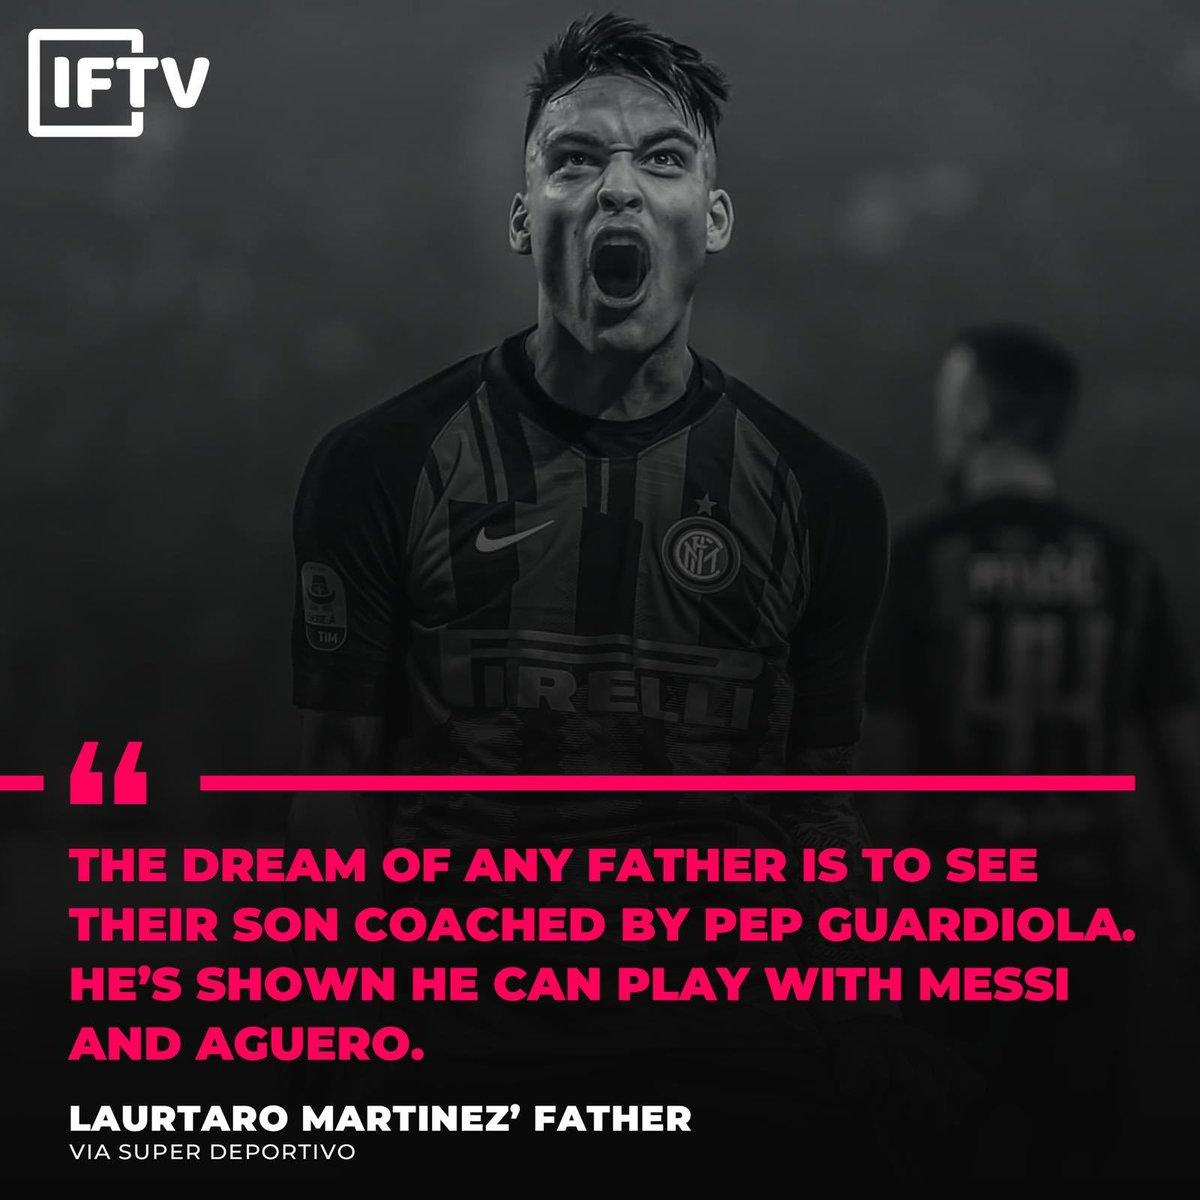 Martinez's dad has a dream ✨💫